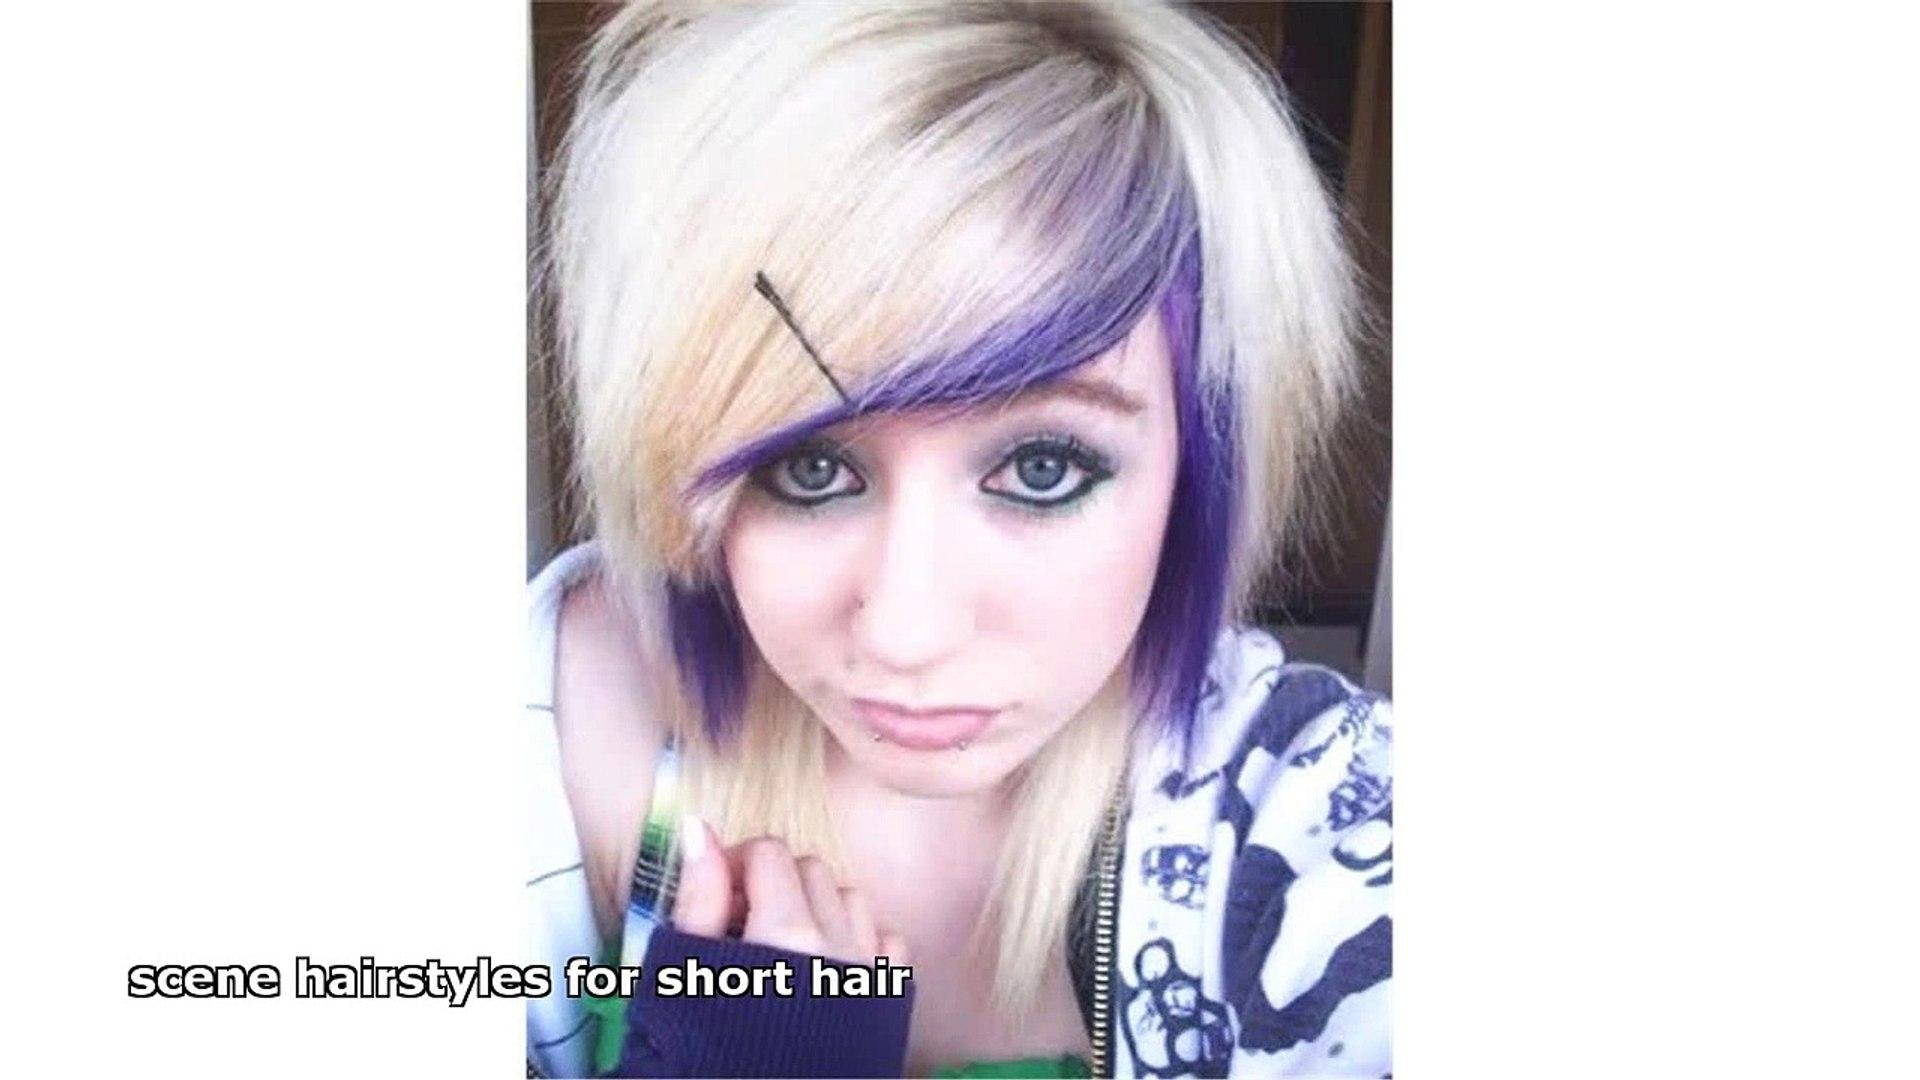 scene hairstyles for short hair